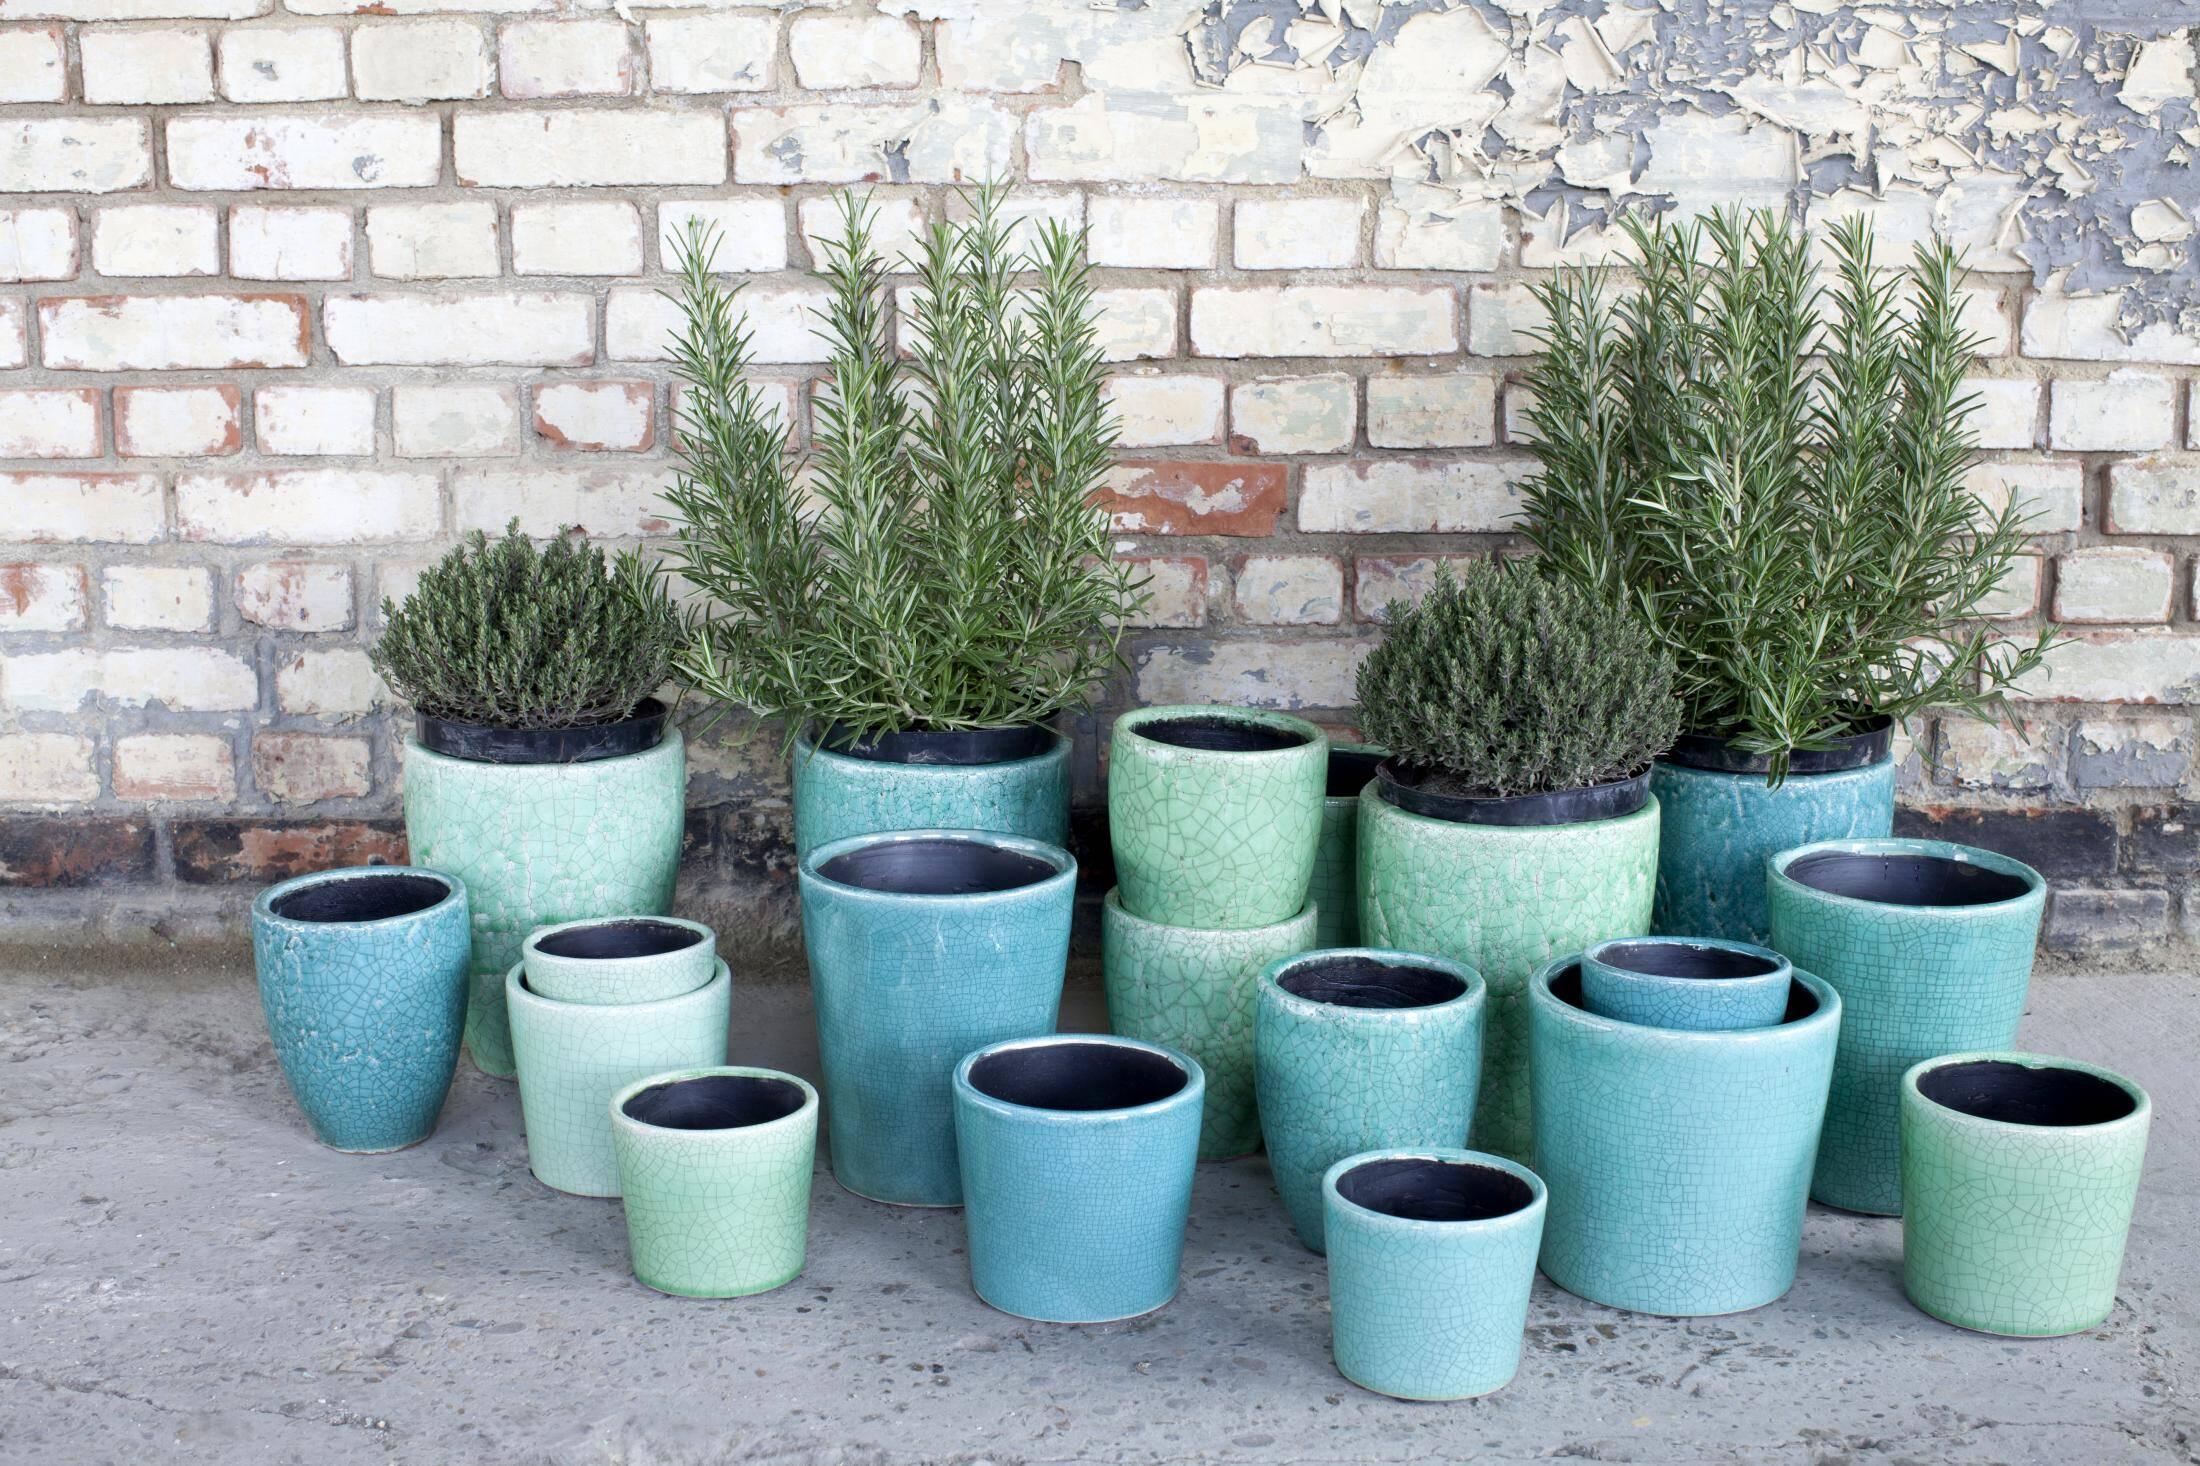 Serax - Flower pots can transform any garden or interior (1)